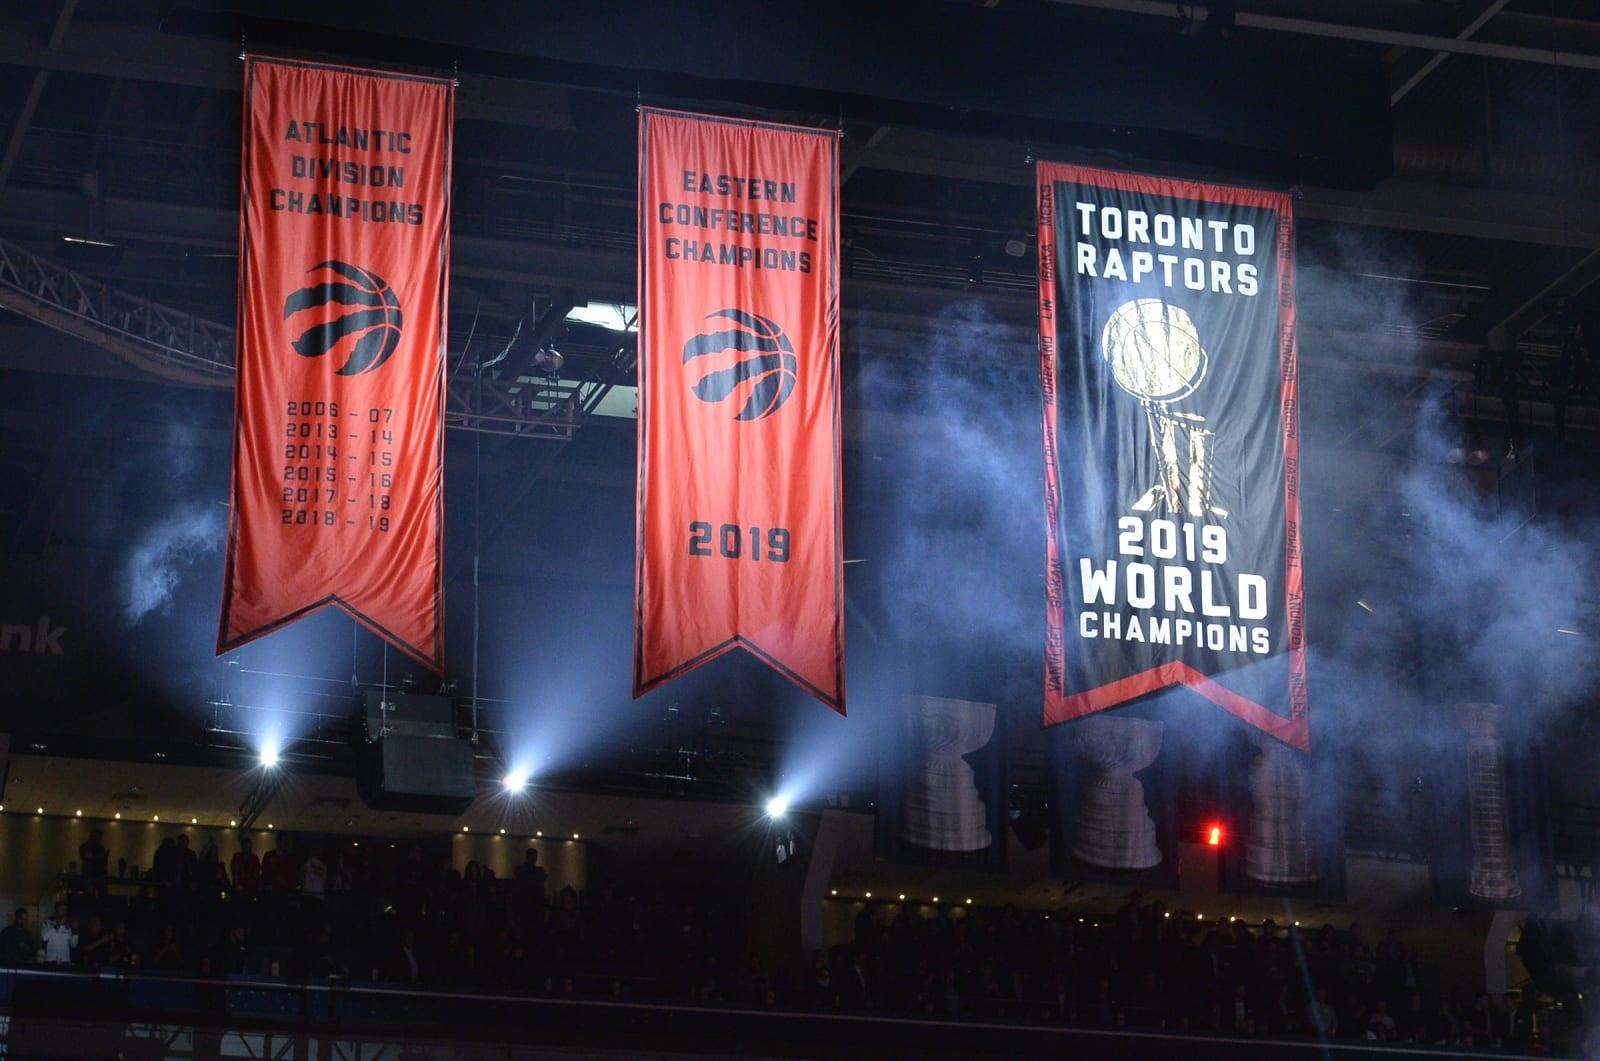 Toronto Raptors - Championship Banner